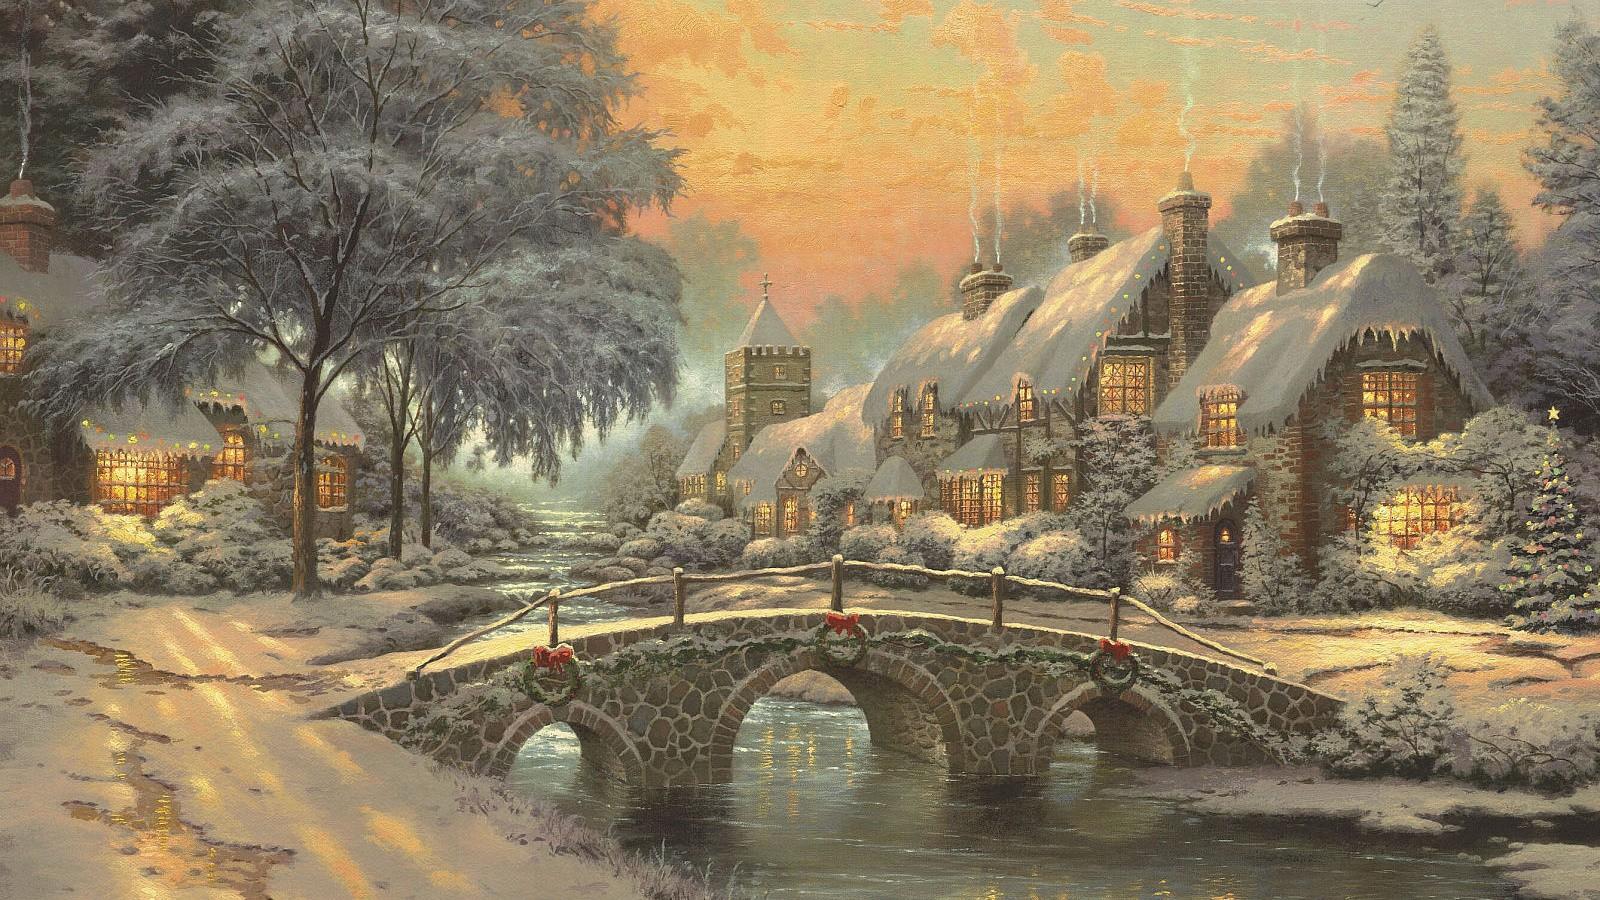 1600x900 hd desktop wallpaper winter - photo #2